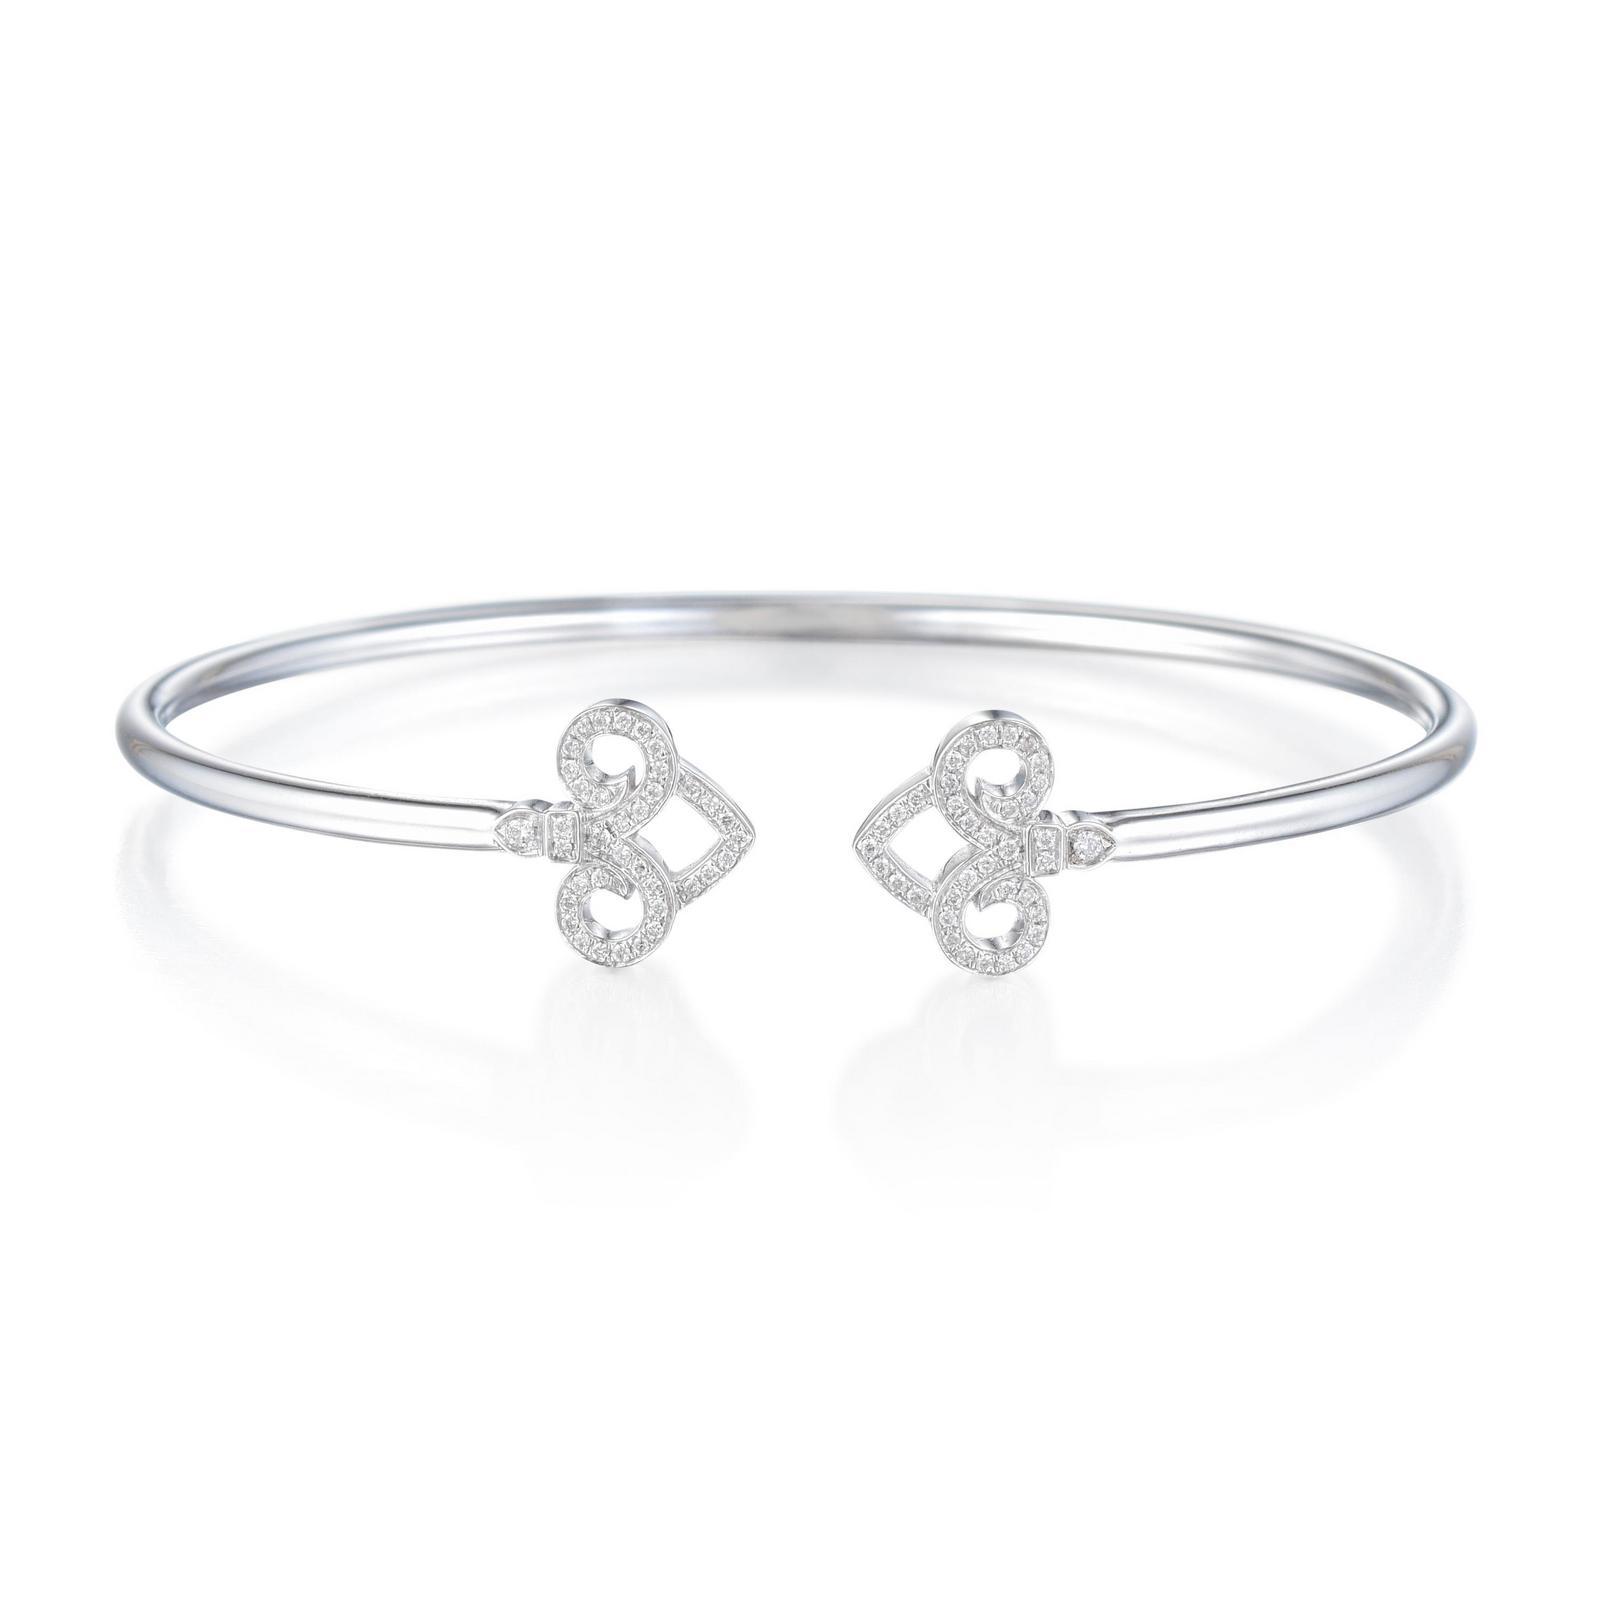 35b132dc9 Tiffany & Co. Fleur de Lis Wire Bangle | Fortuna Fine Jewelry ...